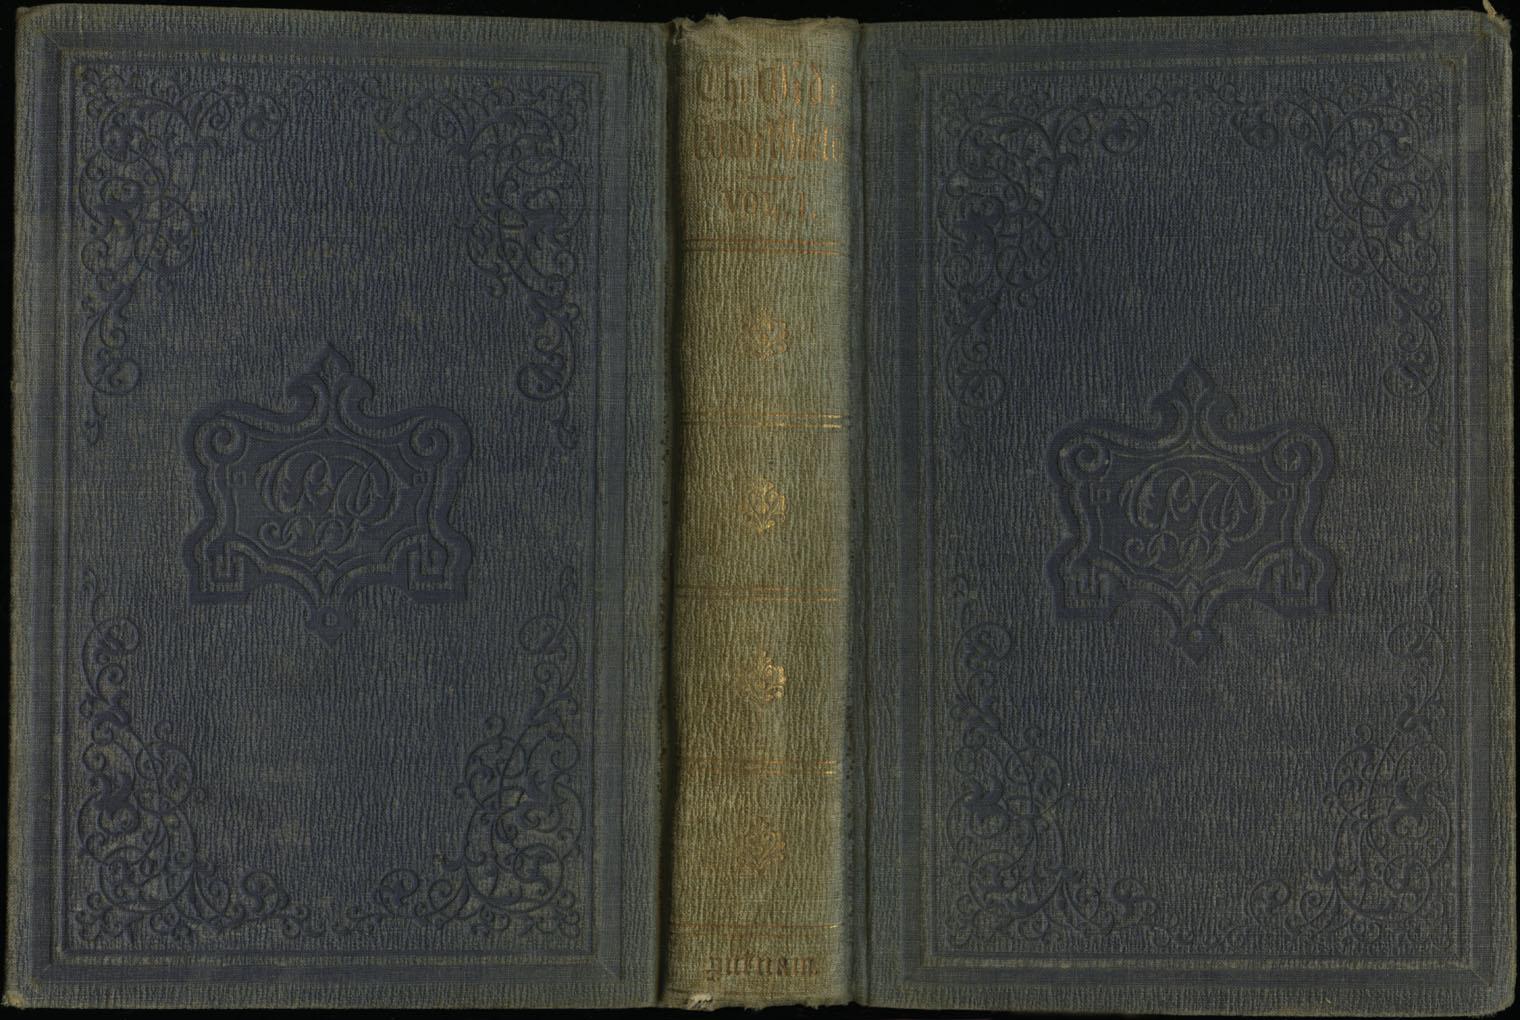 74CIA_Putnam_1851_vol1_full_ed.jpg